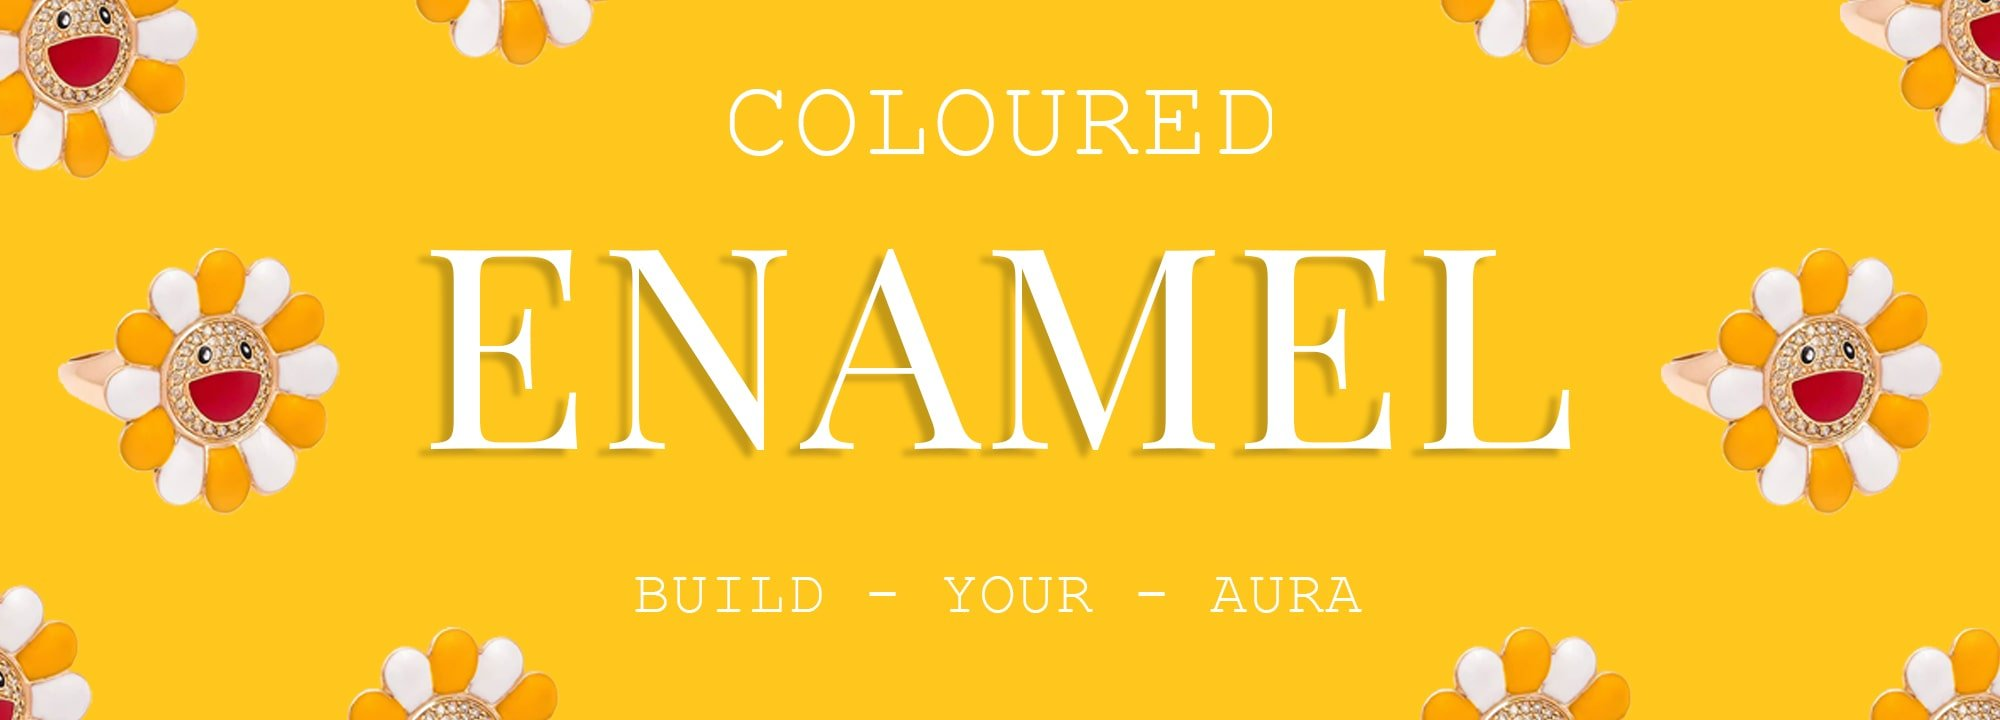 Coloured Enamel